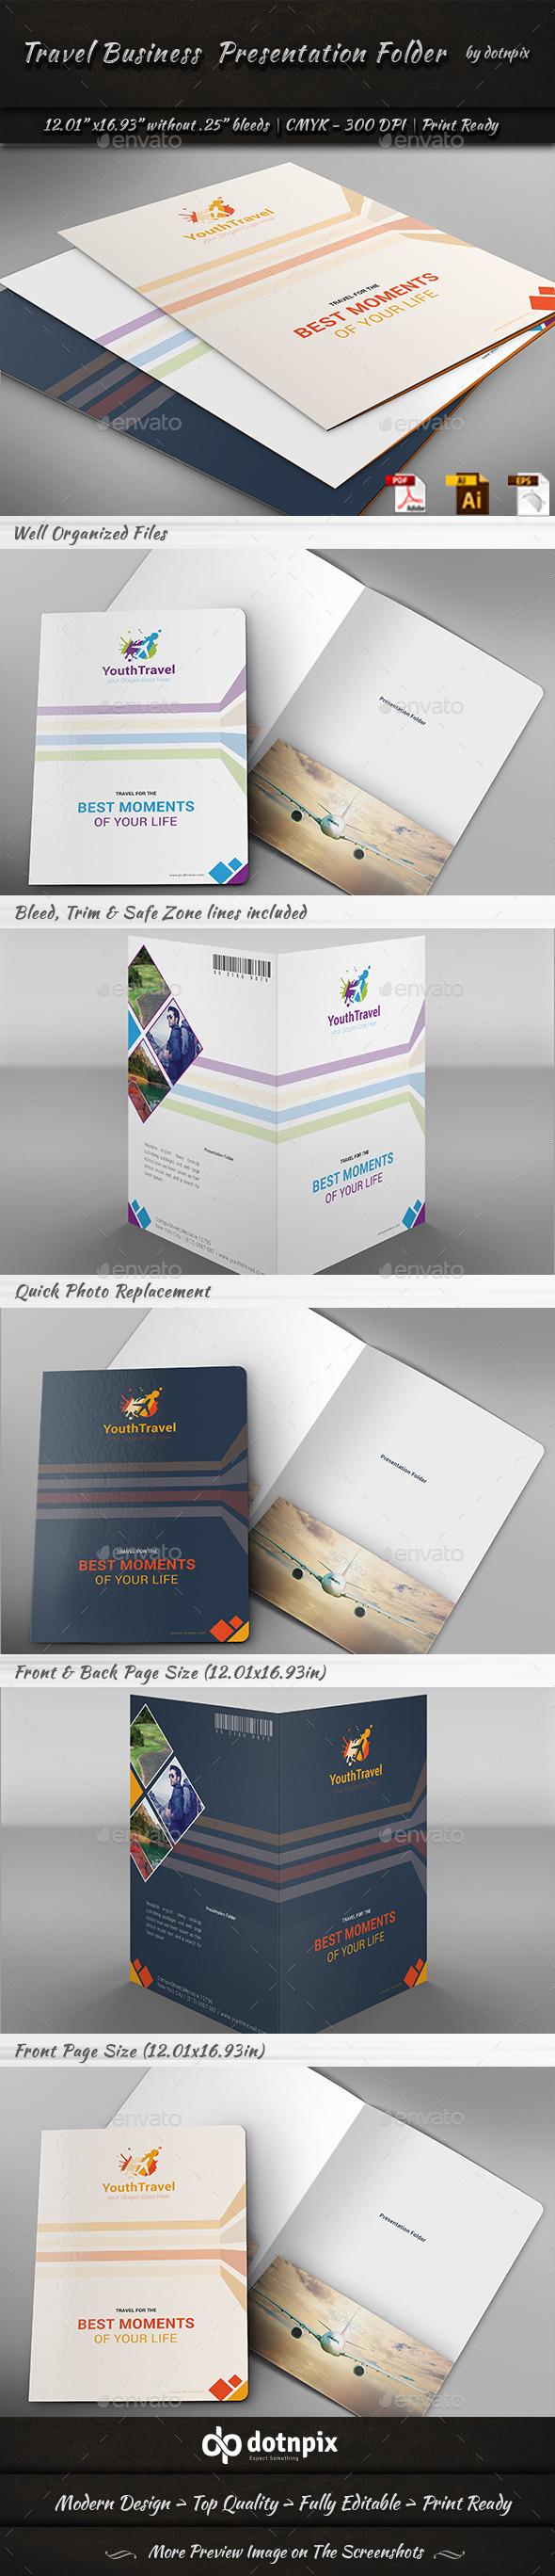 Travel Business Presentation Folder - Stationery Print Templates